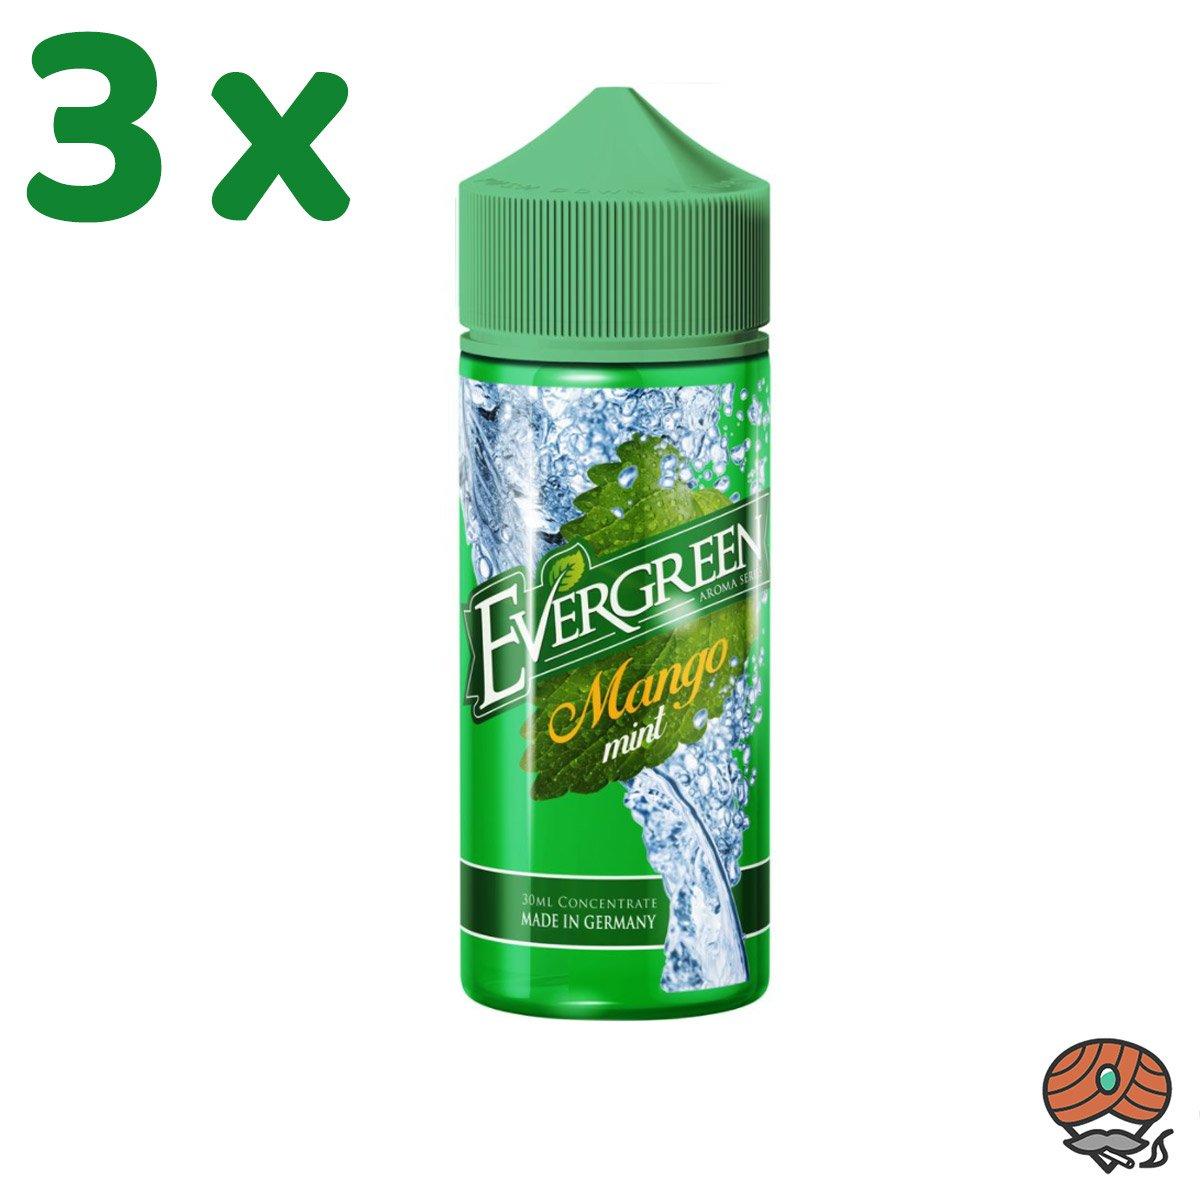 3 x Mango Mint Evergreen Aroma à 30 ml